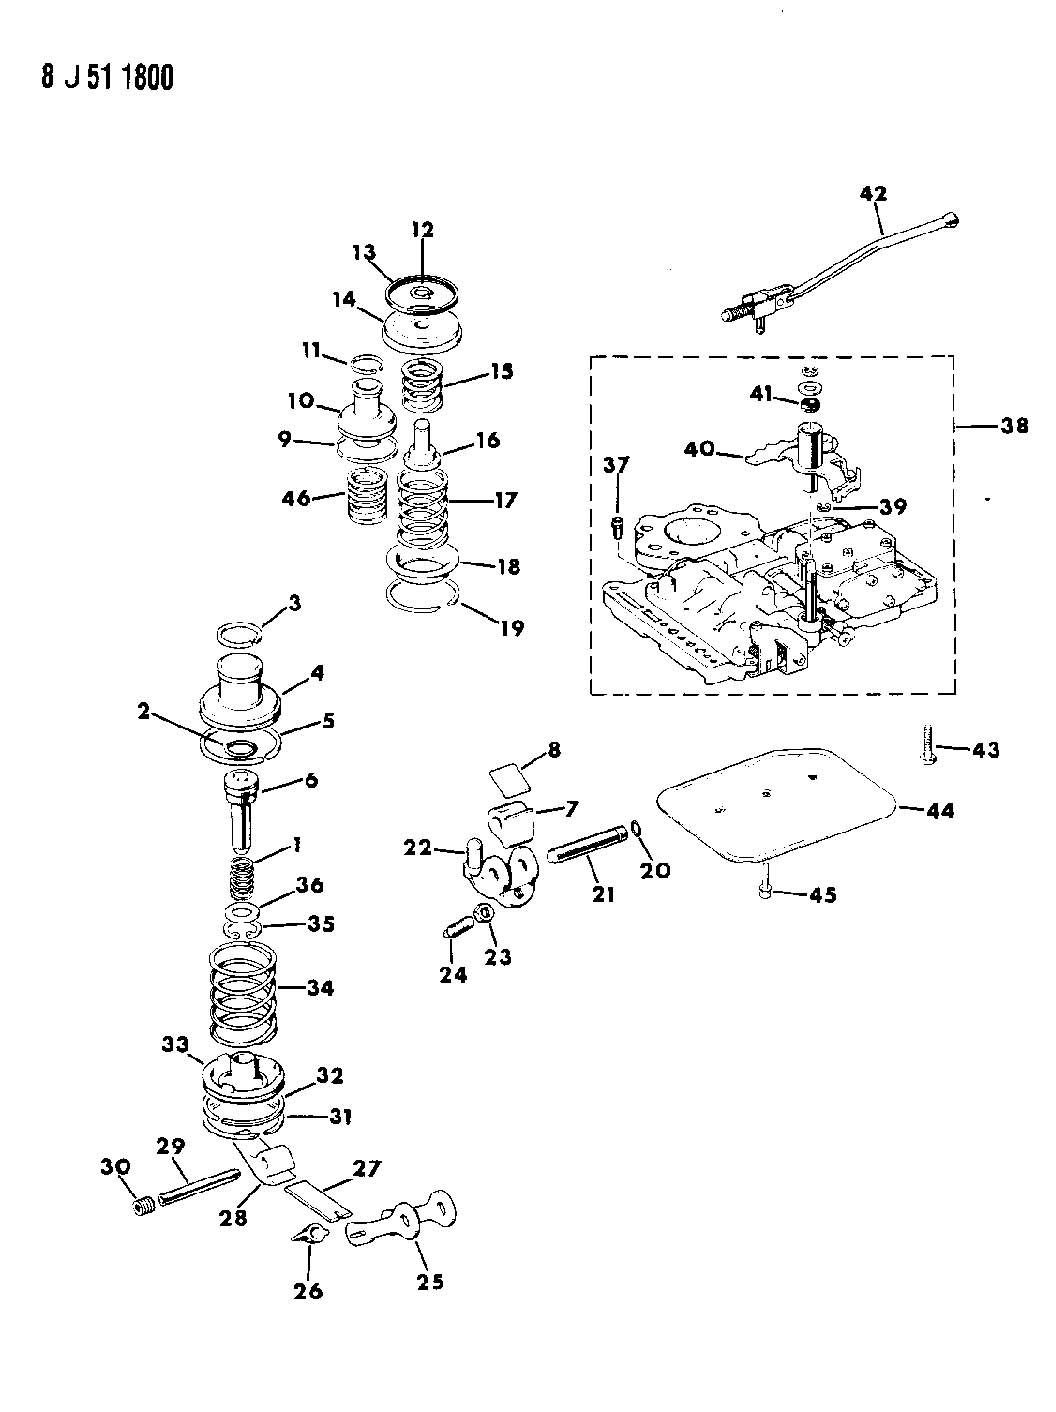 Servos Accumulator And Valve Body Automatic Transmission